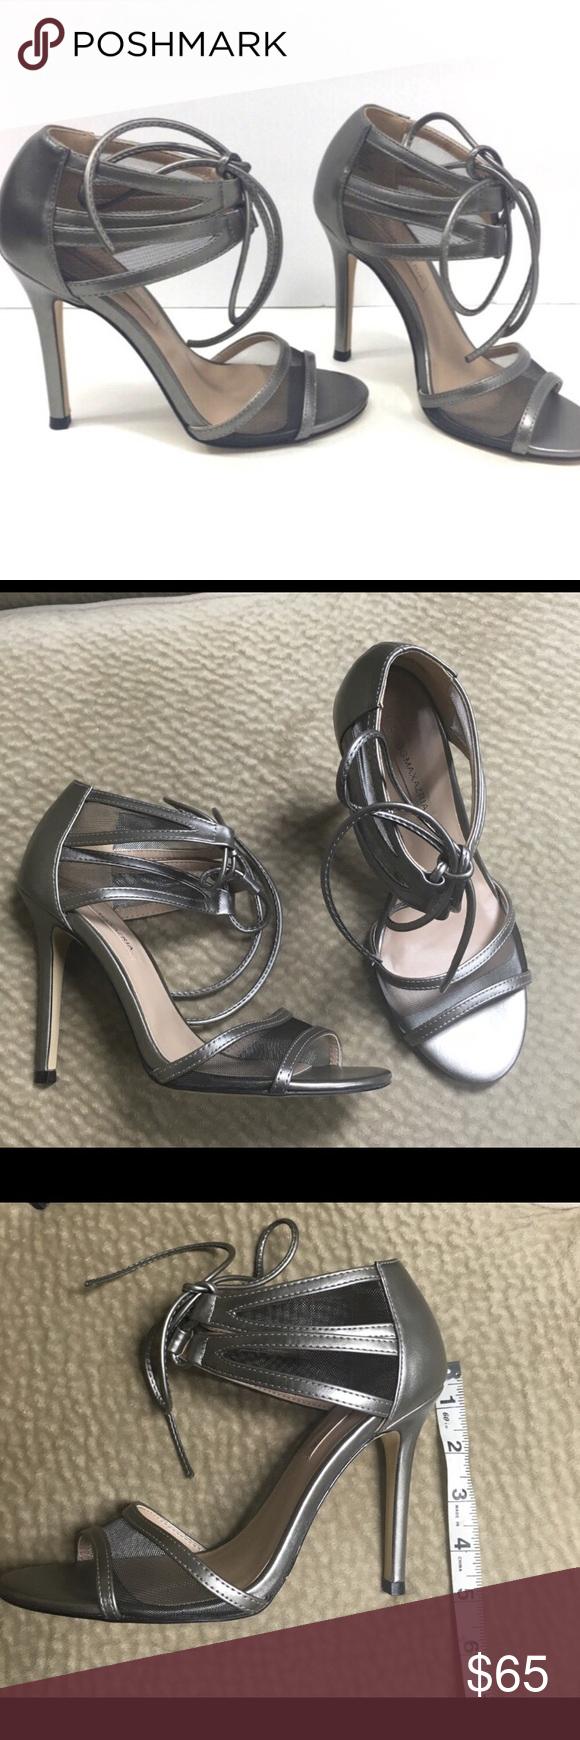 Bcbgmaxazria Metallic heels size 8 NWT NWT NWT   My Posh Picks   Pinterest   c101e1